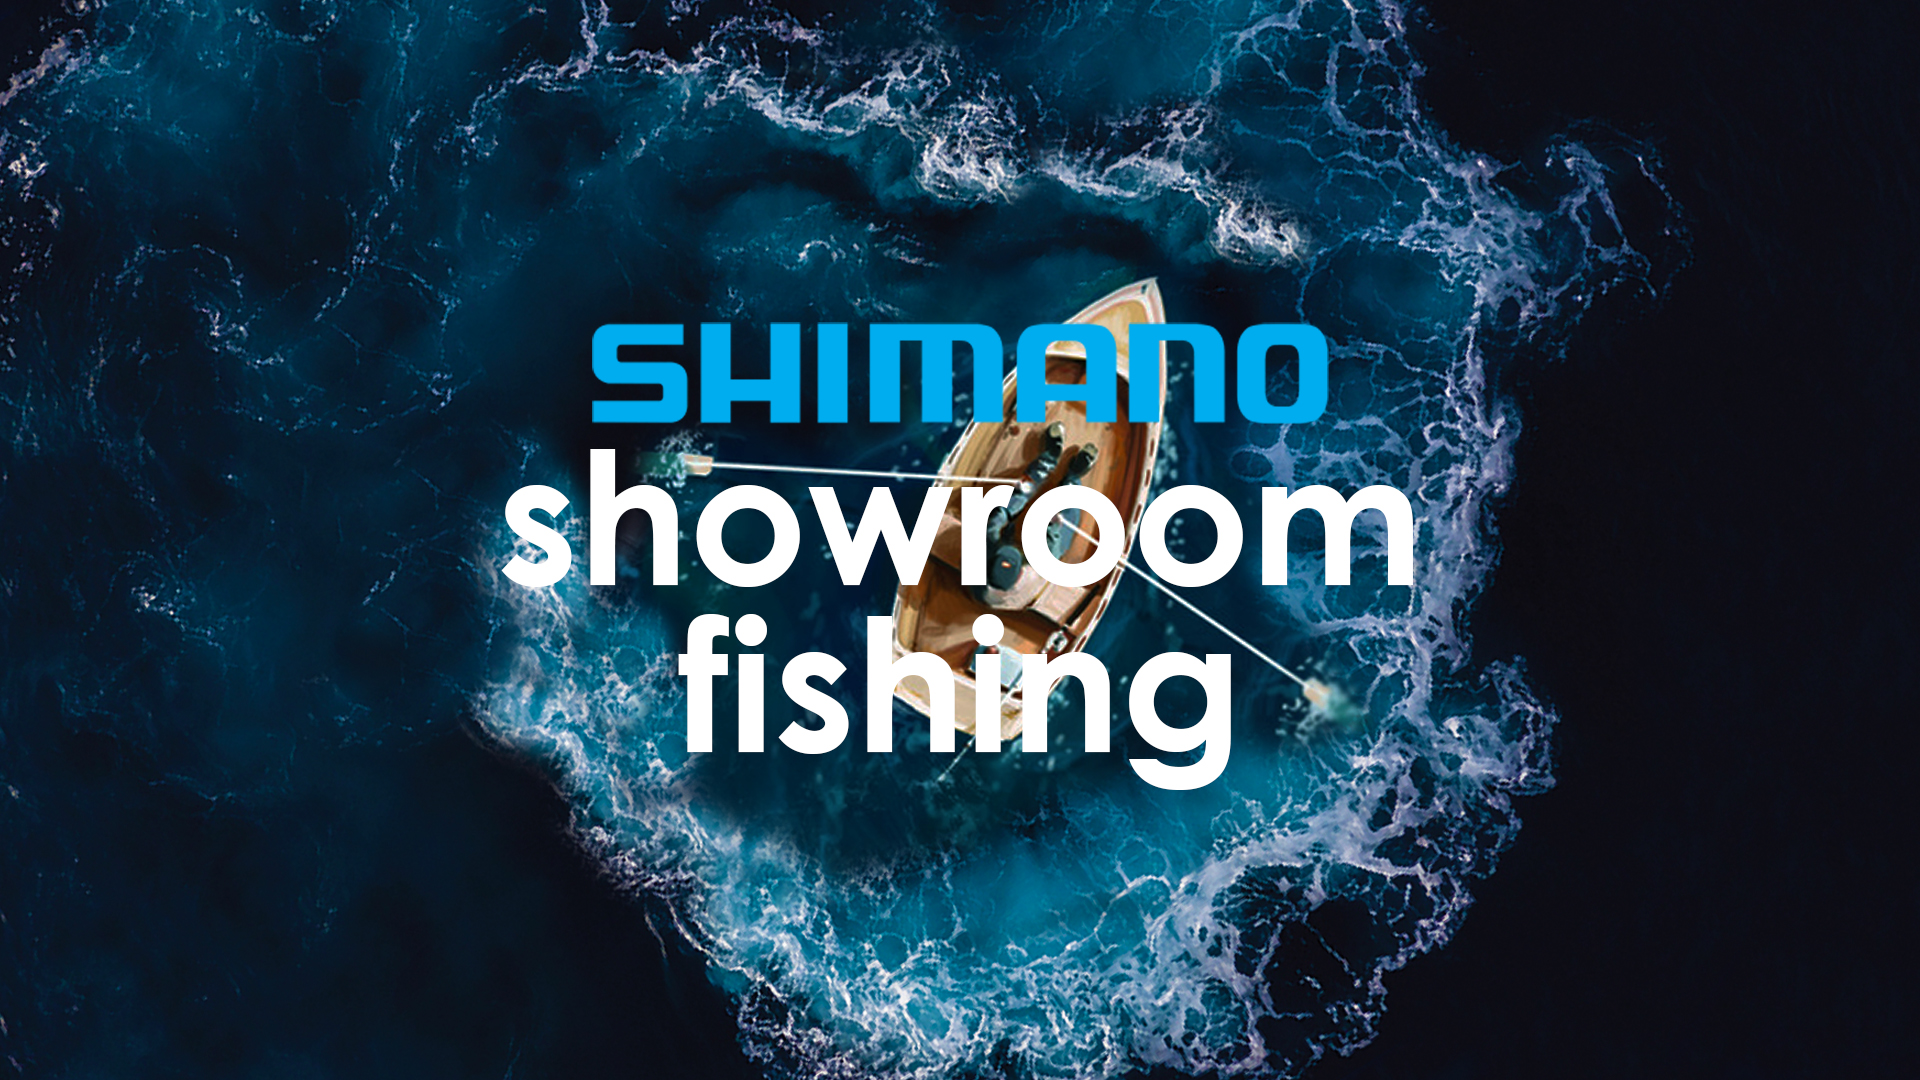 SHIMANO SHOWROOM FISHING